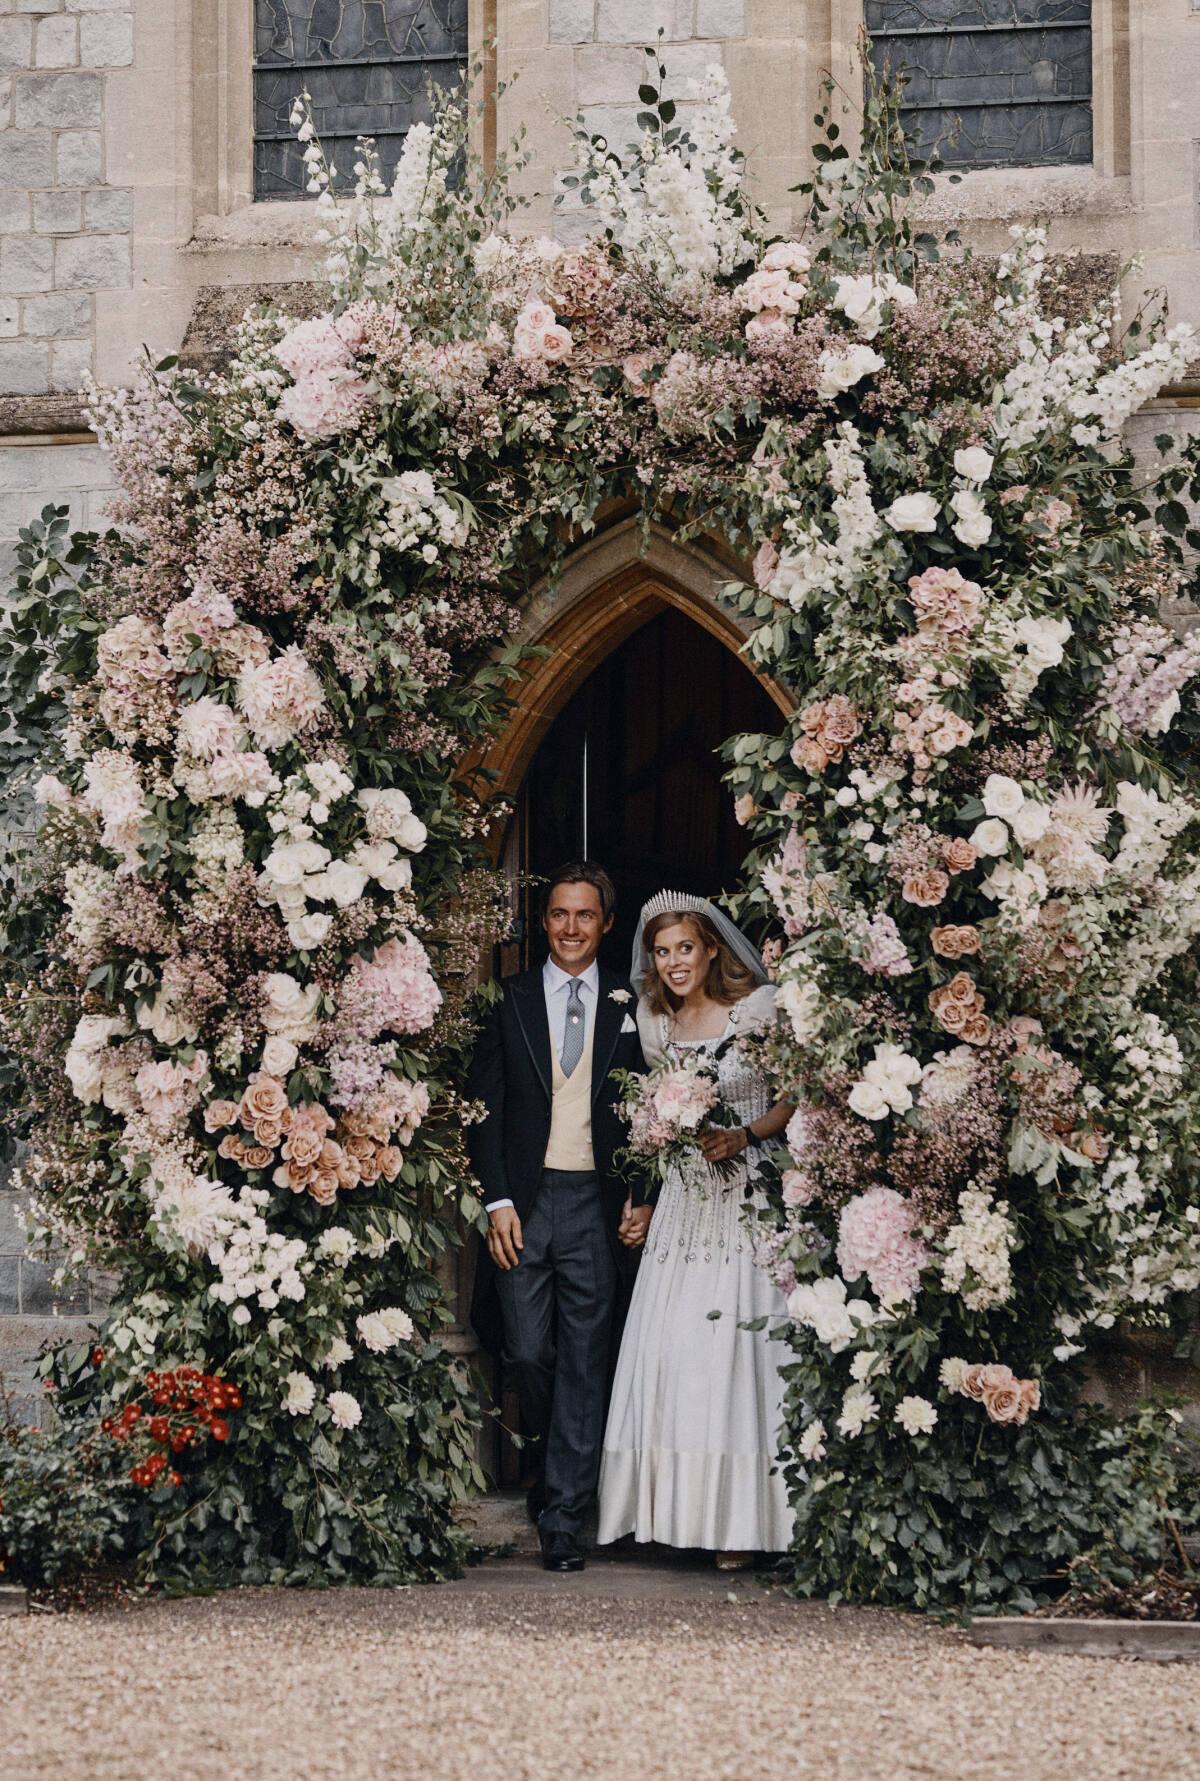 Vintage dress, no Prince Andrew in Beatrice's wedding photos